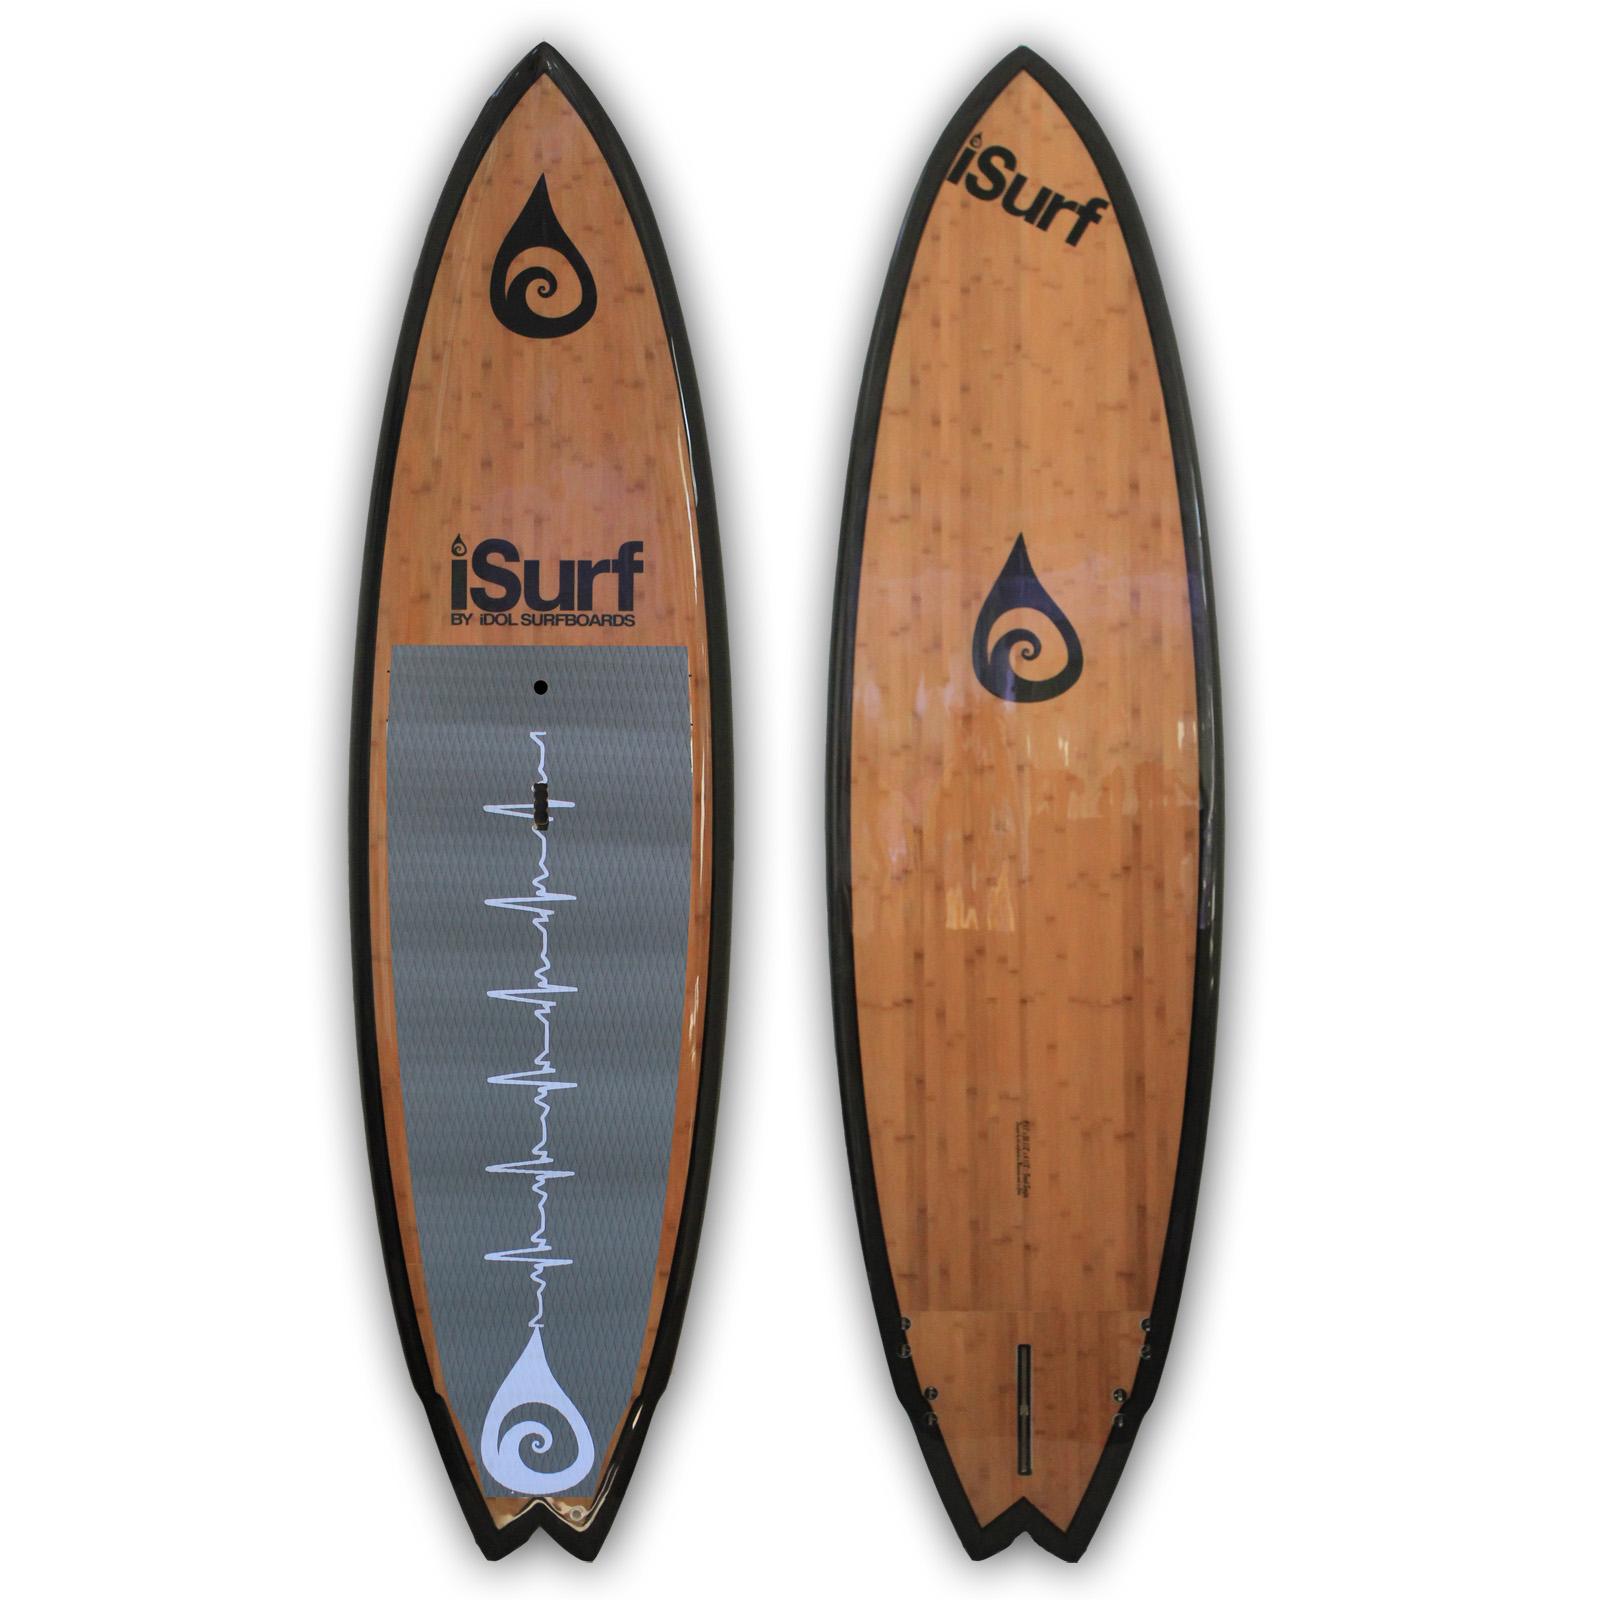 9 11 Fresh Surfer Carbon Bamboo Idol Wake Surfing